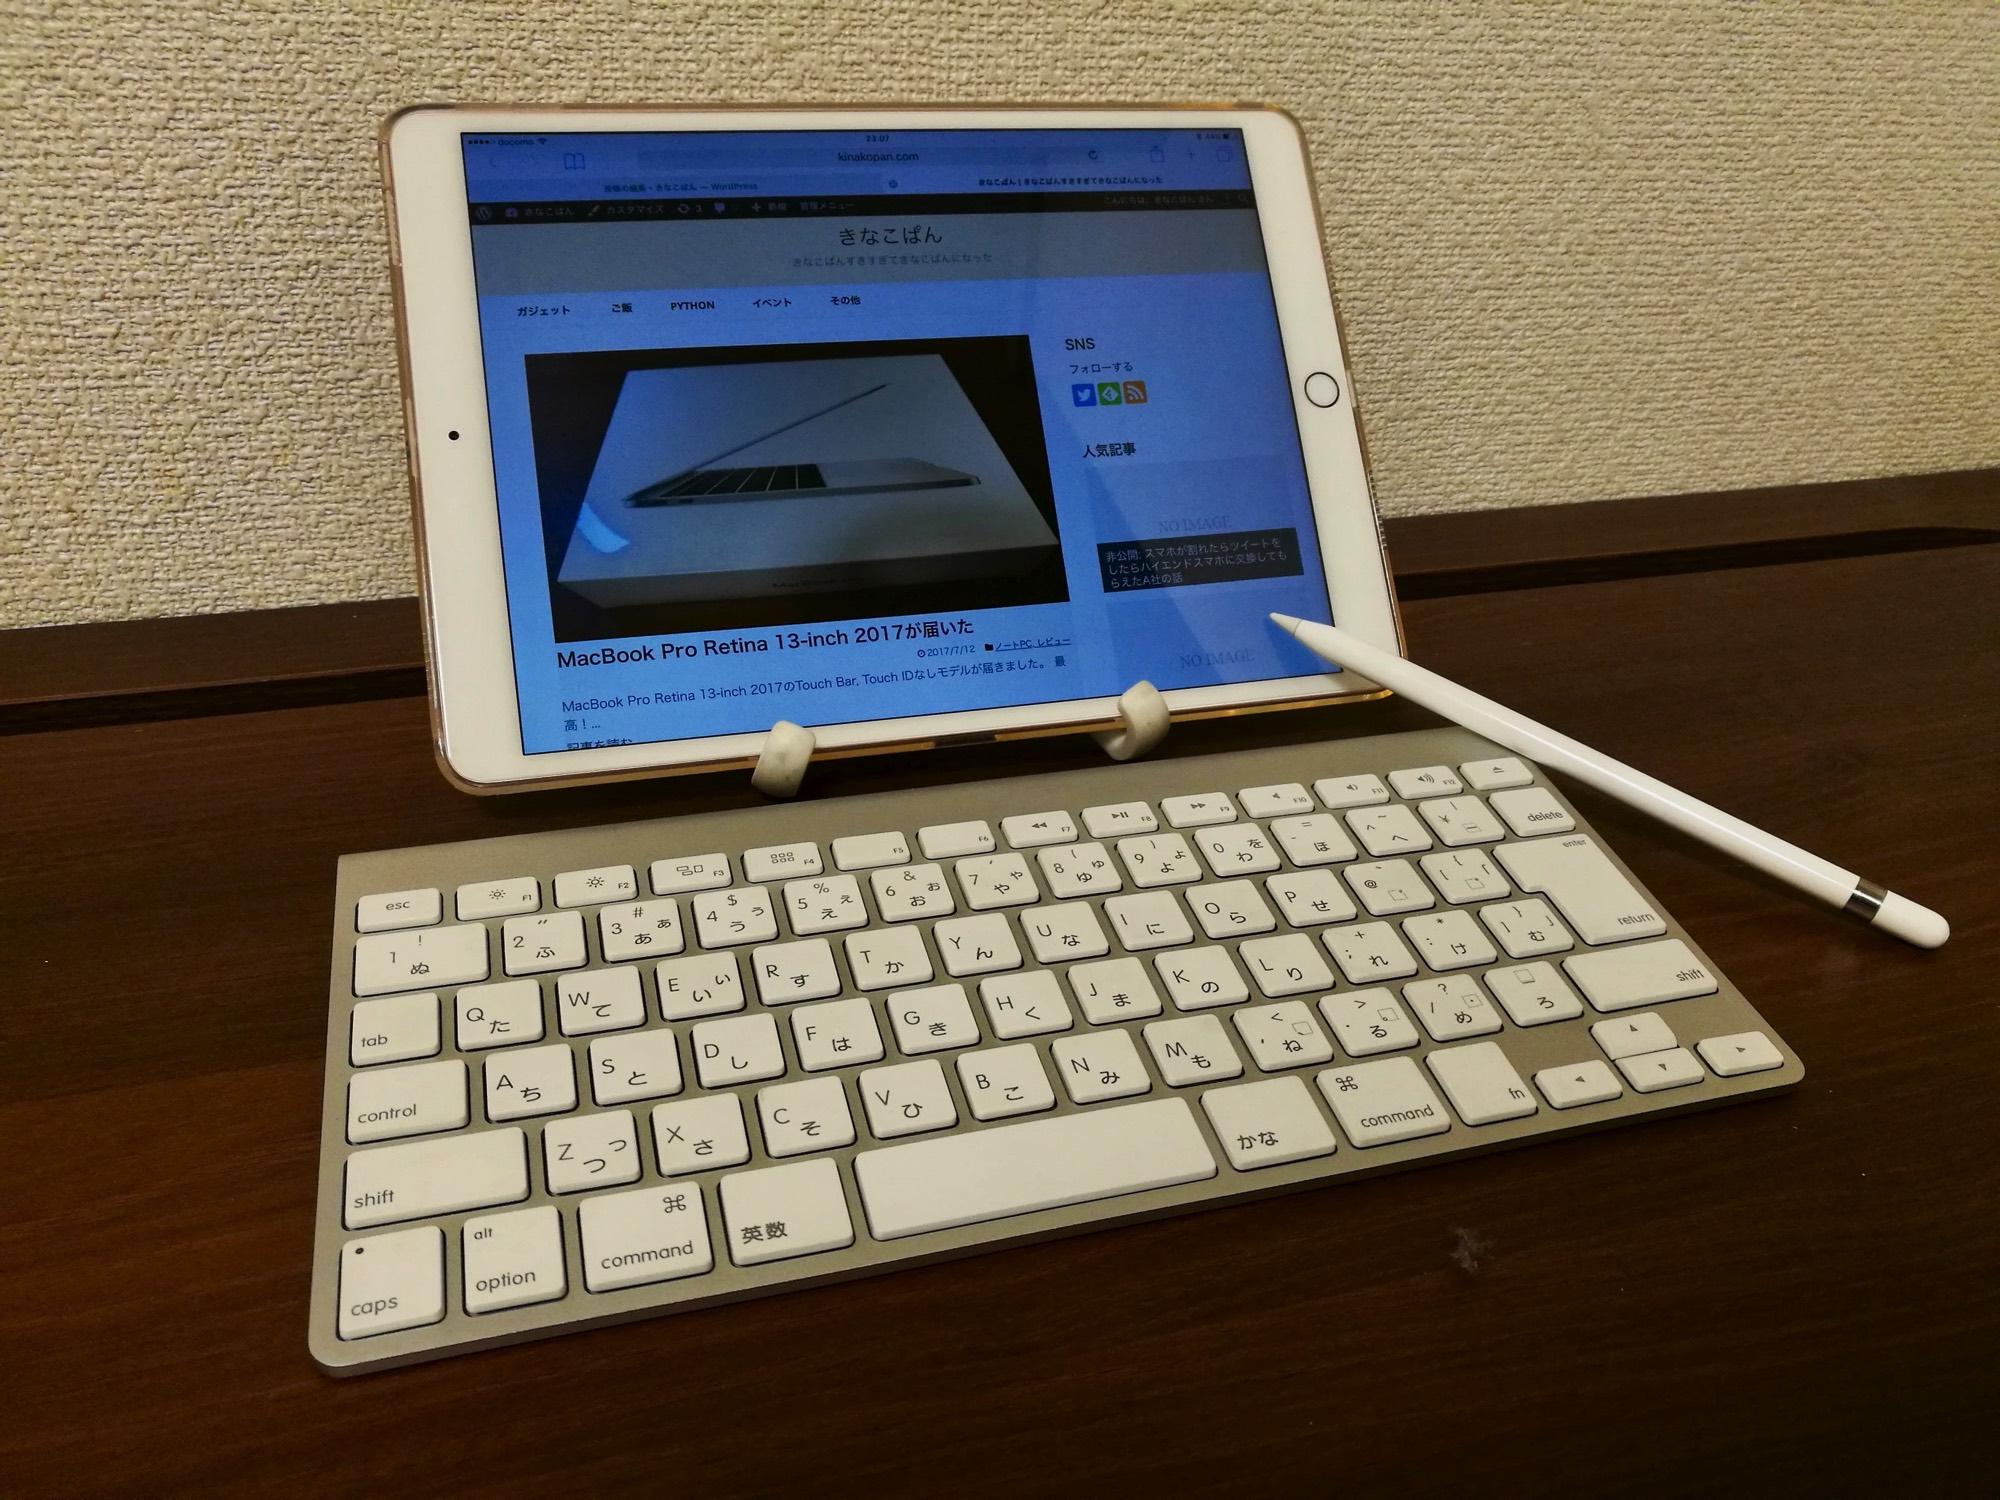 ipad pro smart keyboard magic keyboard. Black Bedroom Furniture Sets. Home Design Ideas